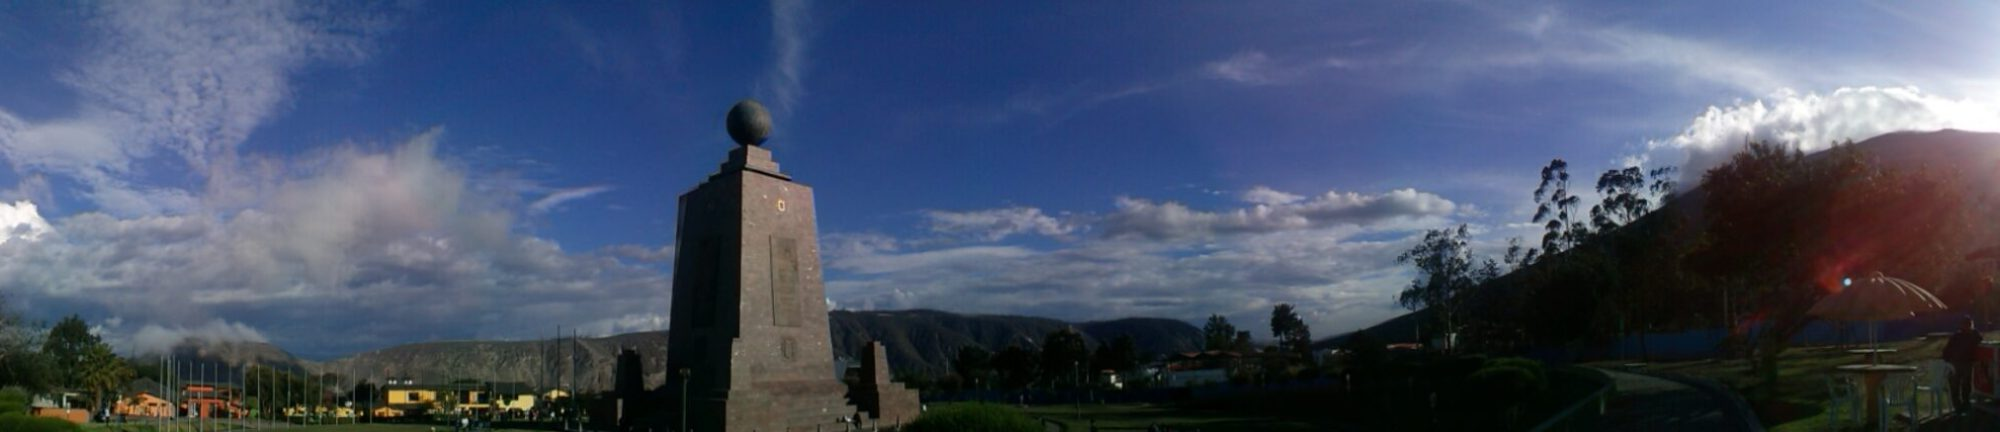 K in Motion Travel Blog. Mitad del Mundo, Quito, Ecuador